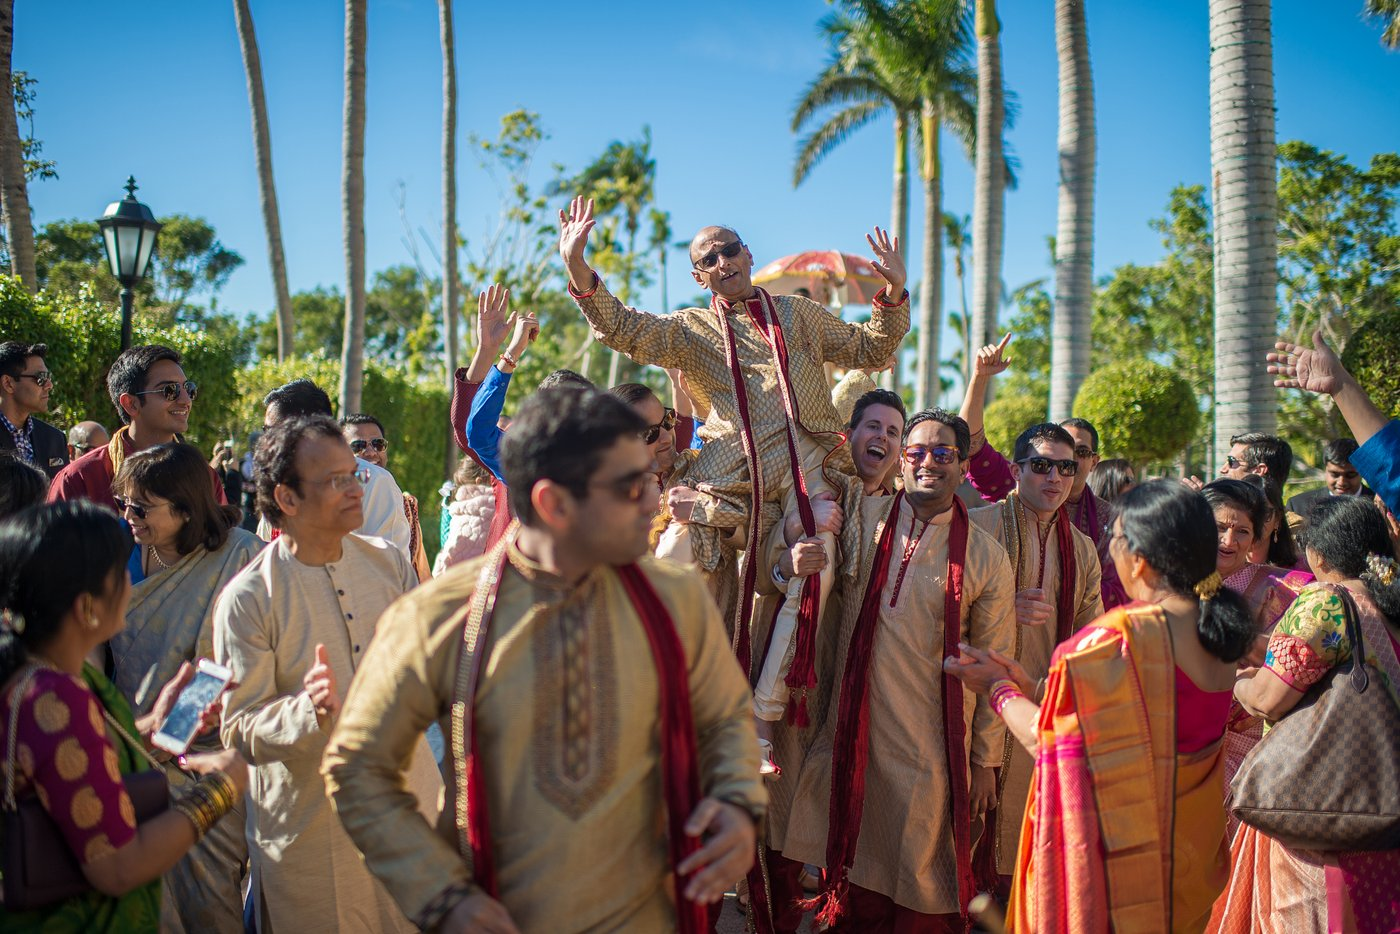 Key Biscayne Indian Wedding Baraat Photos, Miami Wedding Photographers   Häring Photography, Indian Wedding Photographer in Florida, Best Muslim, Hindu - South East Asian Wedding Photographers